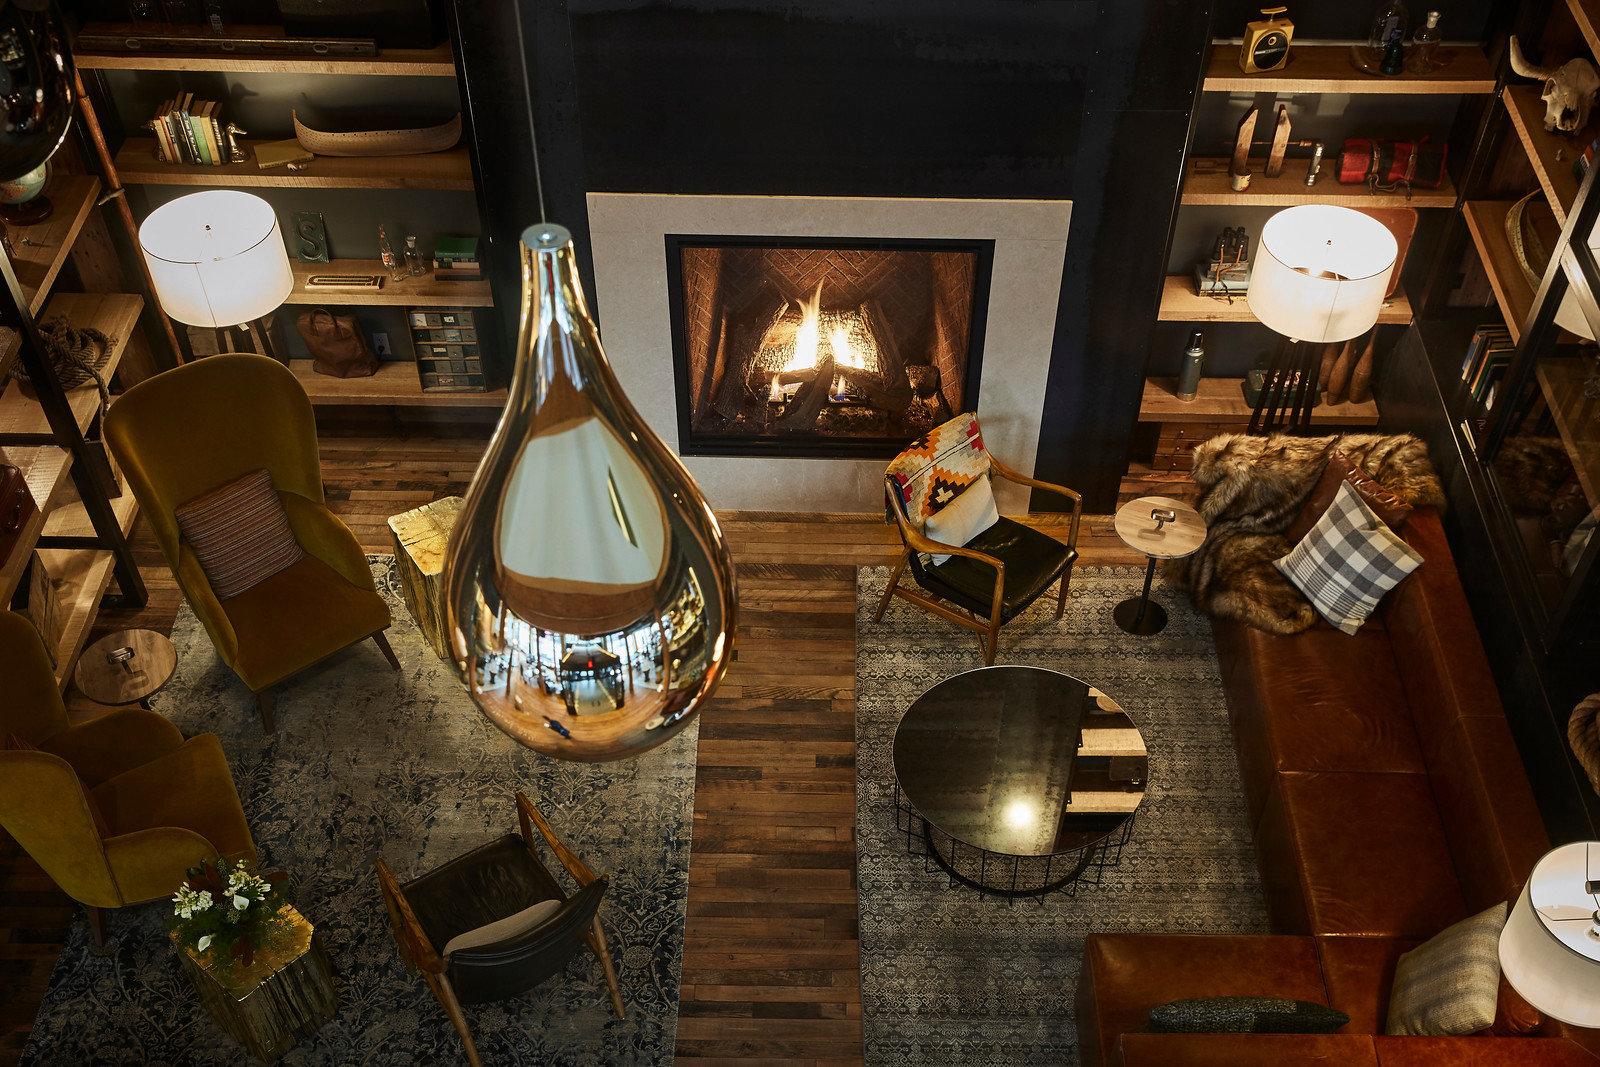 Boutique Hotels Fall Travel Trip Ideas Weekend Getaways indoor room lighting home living room interior design Design restaurant cluttered